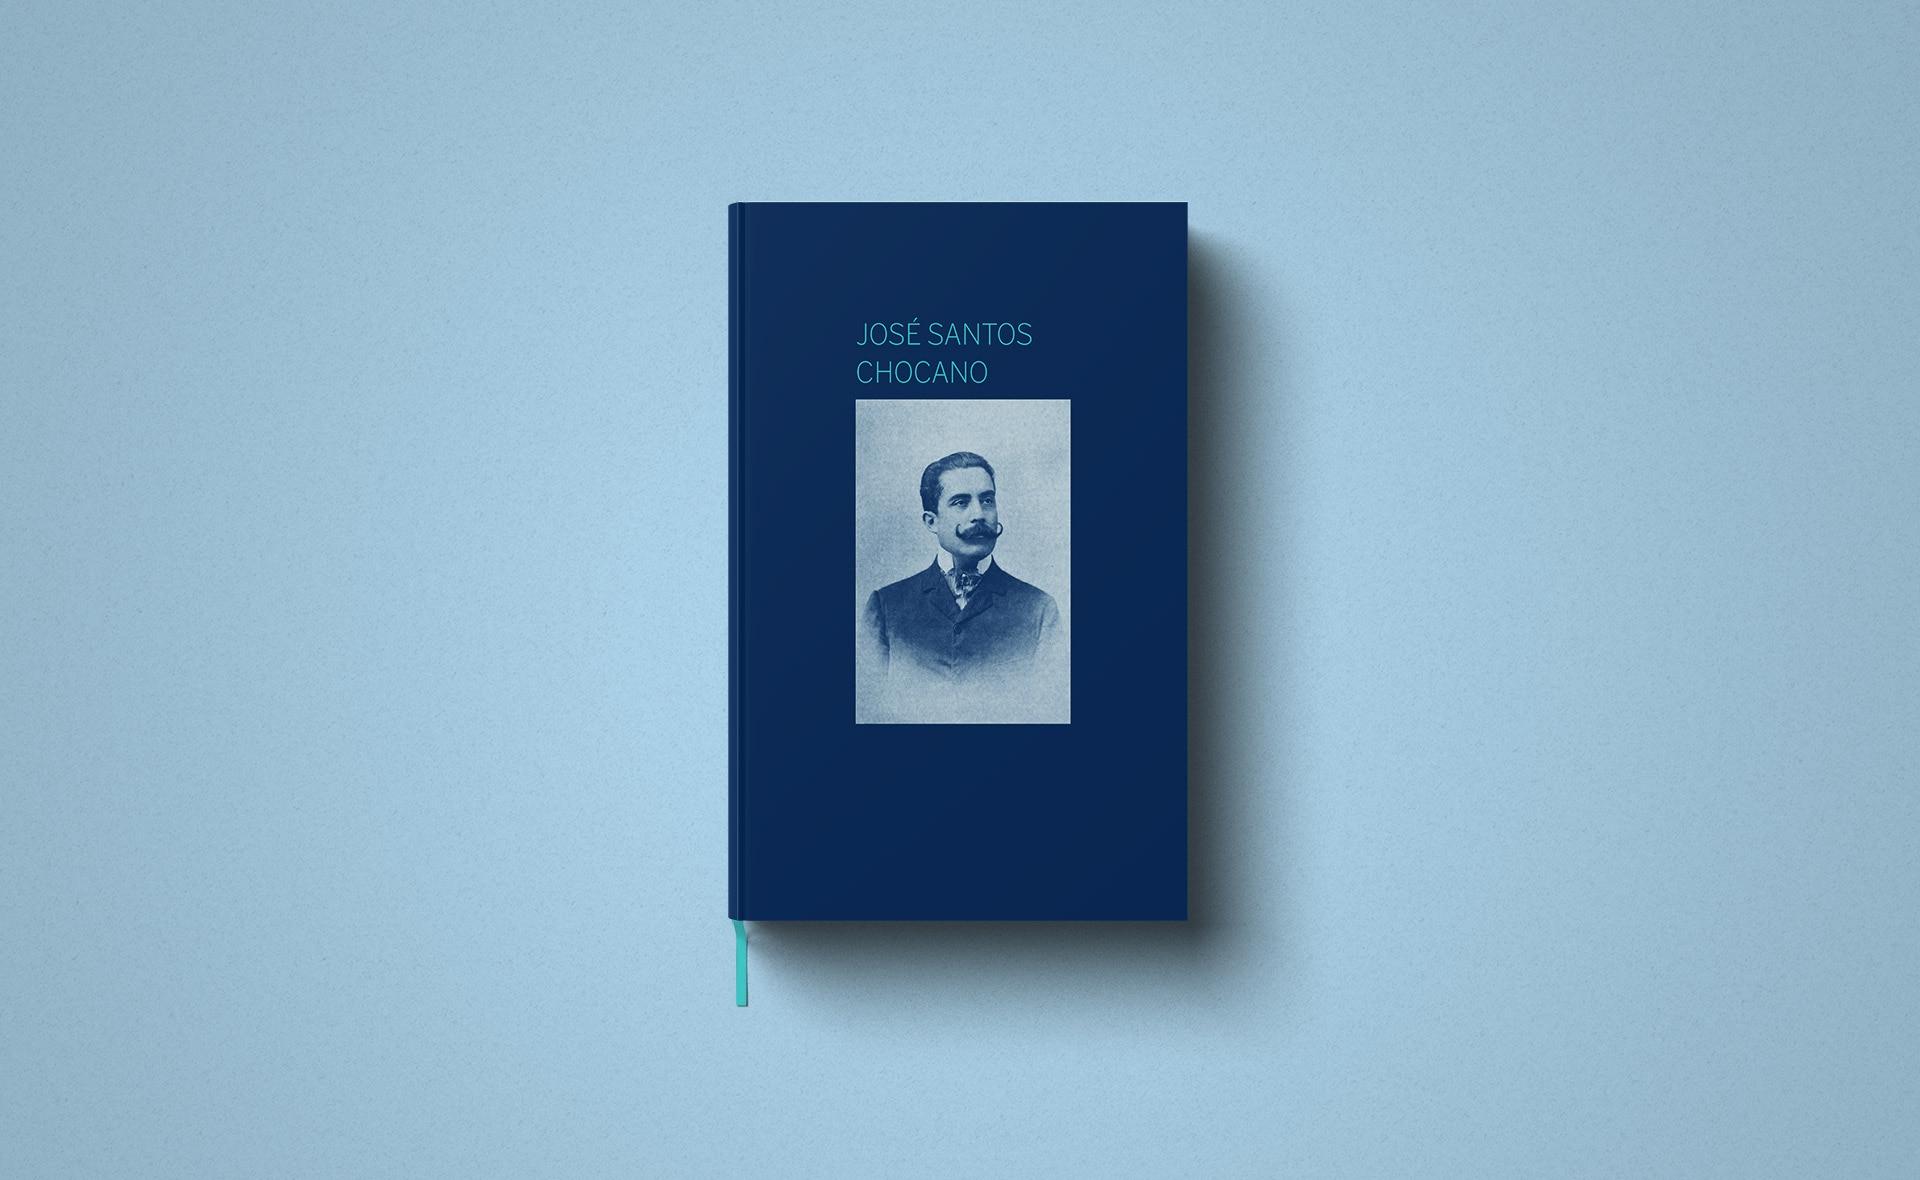 José-Santos-Chocano-autor-poemas-podcast-peru-